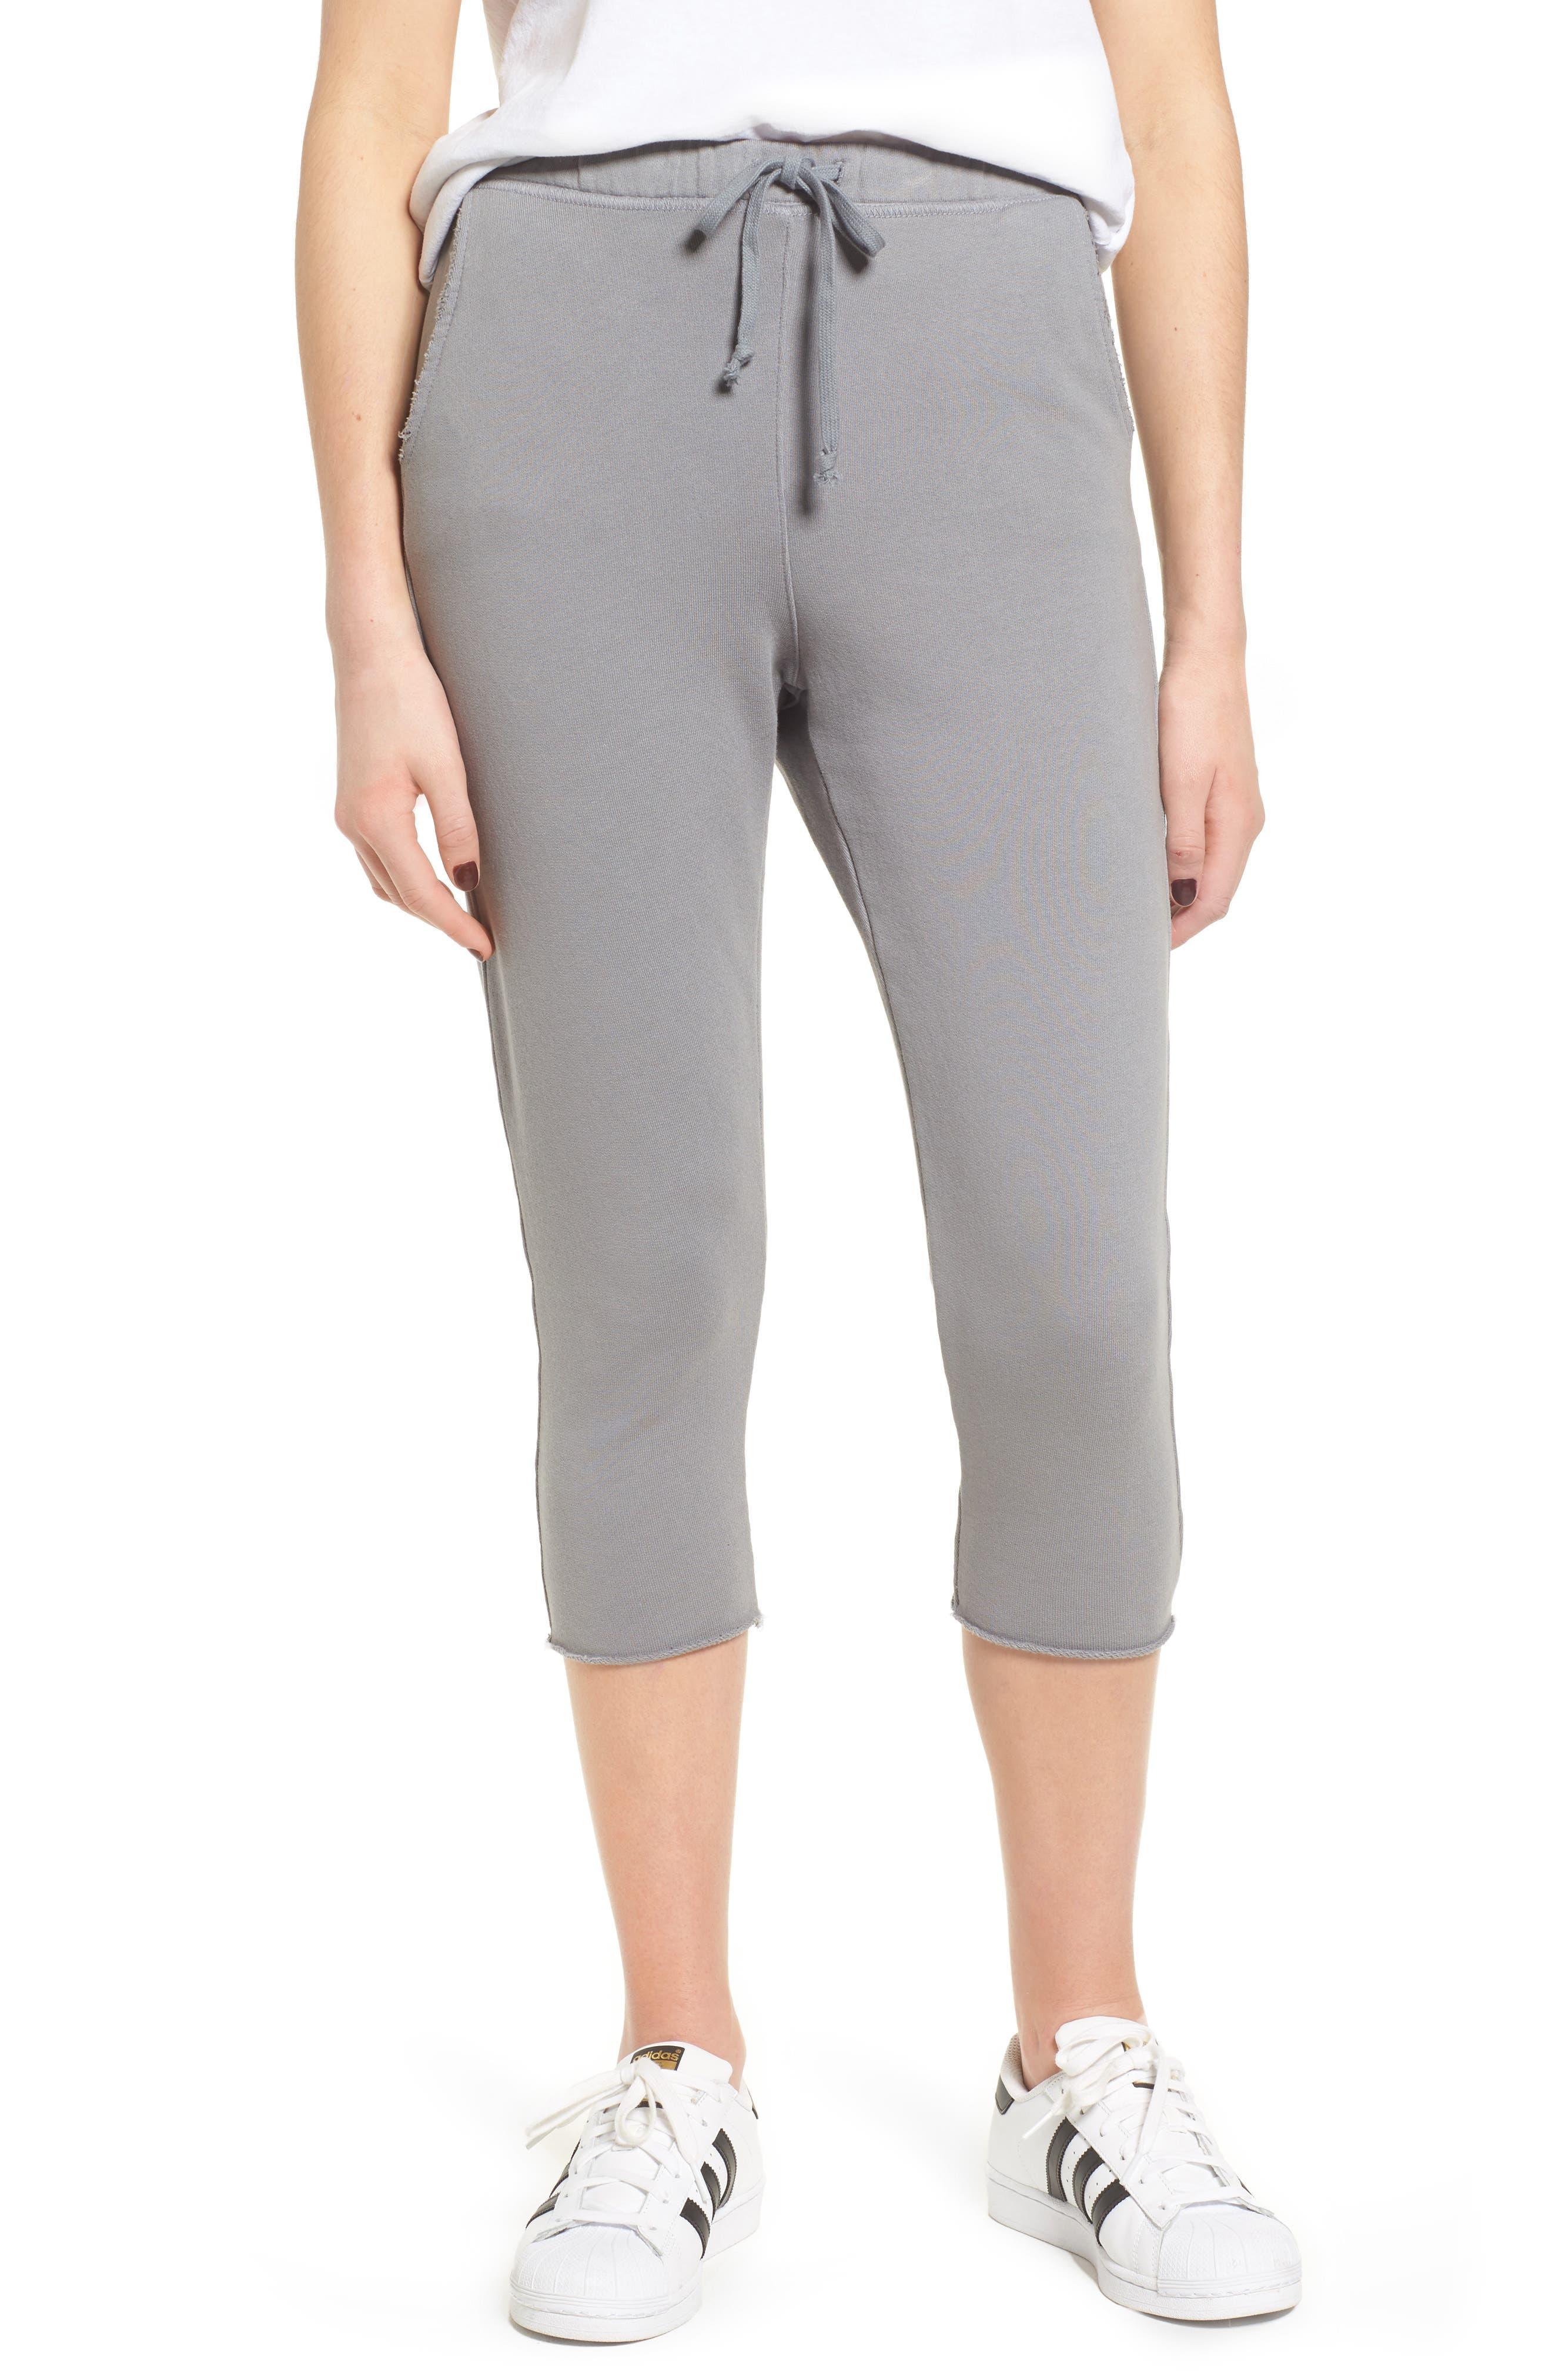 Tee Lab Raw Hem Crop Sweatpants,                             Main thumbnail 1, color,                             Shadow